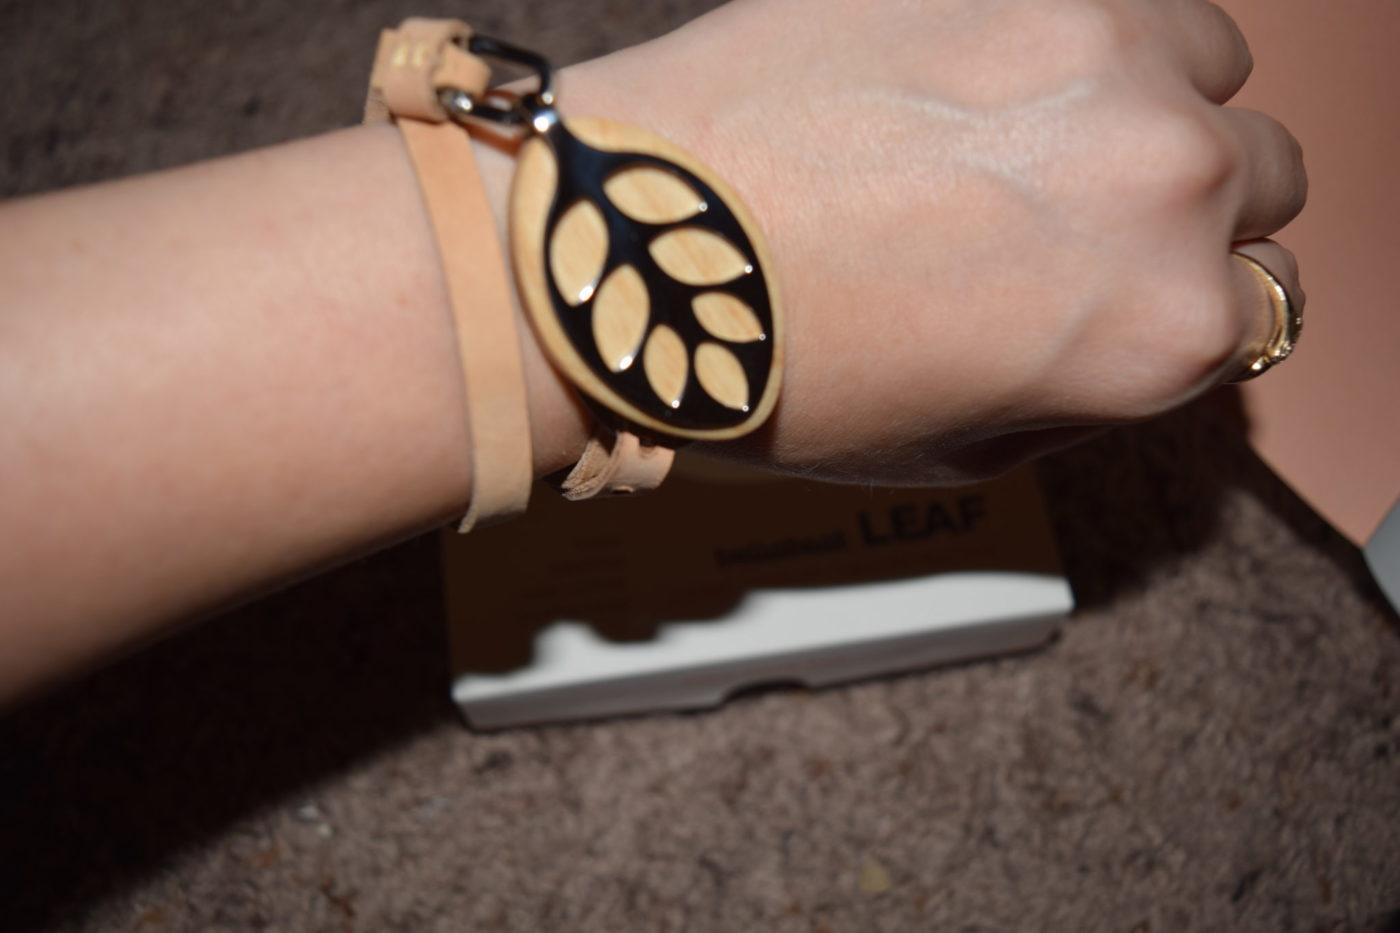 Bellabeat LEAF Smart Jewelry